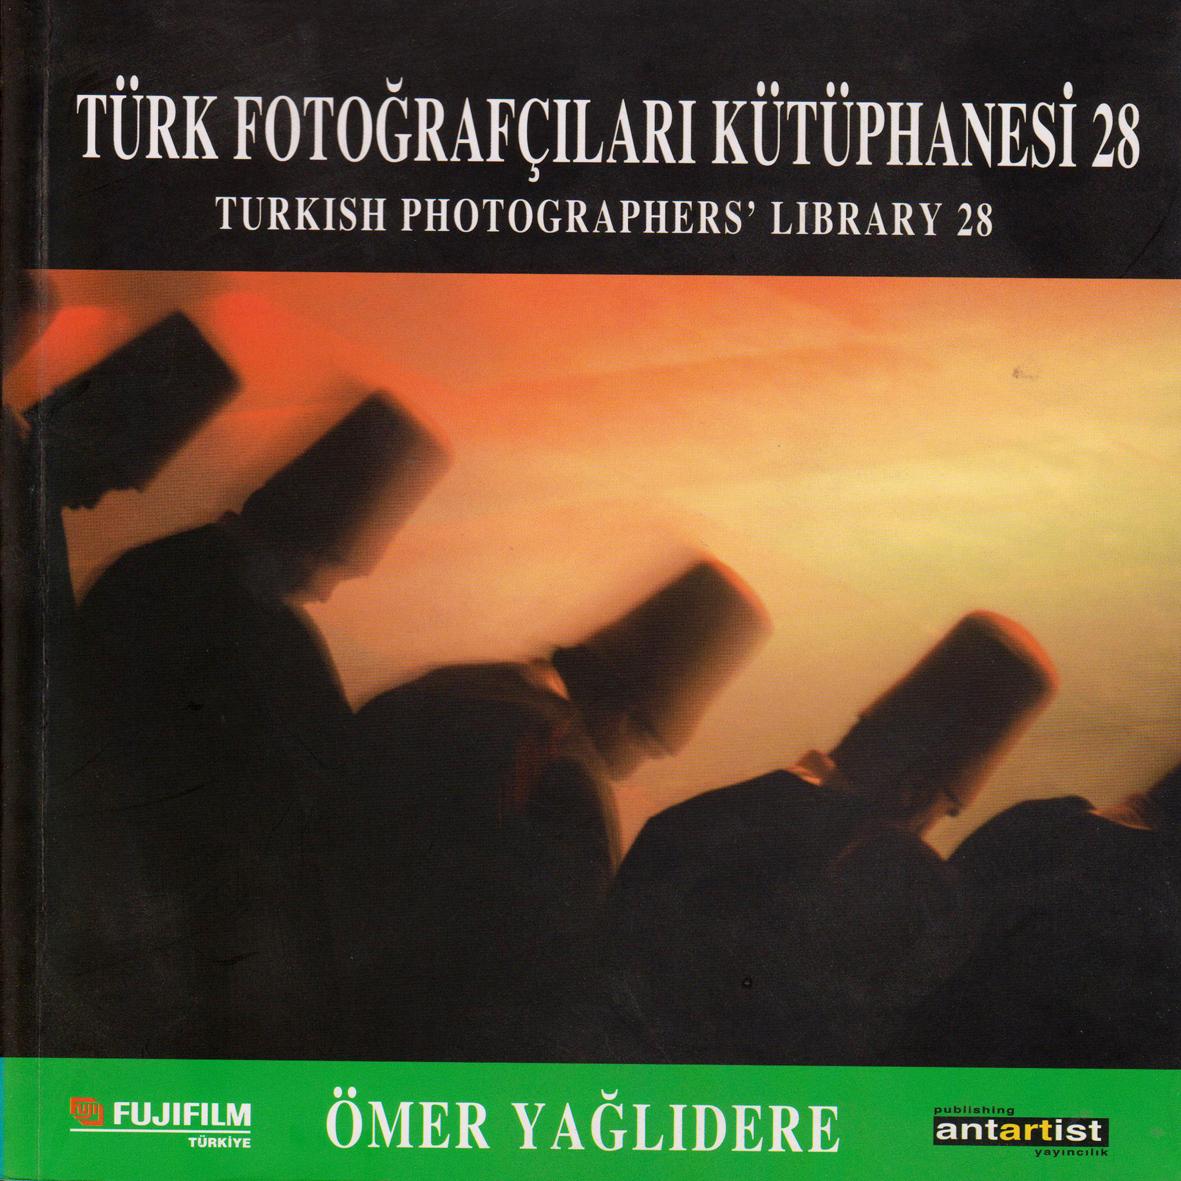 Turk Fotografcilari Kutuphanesi